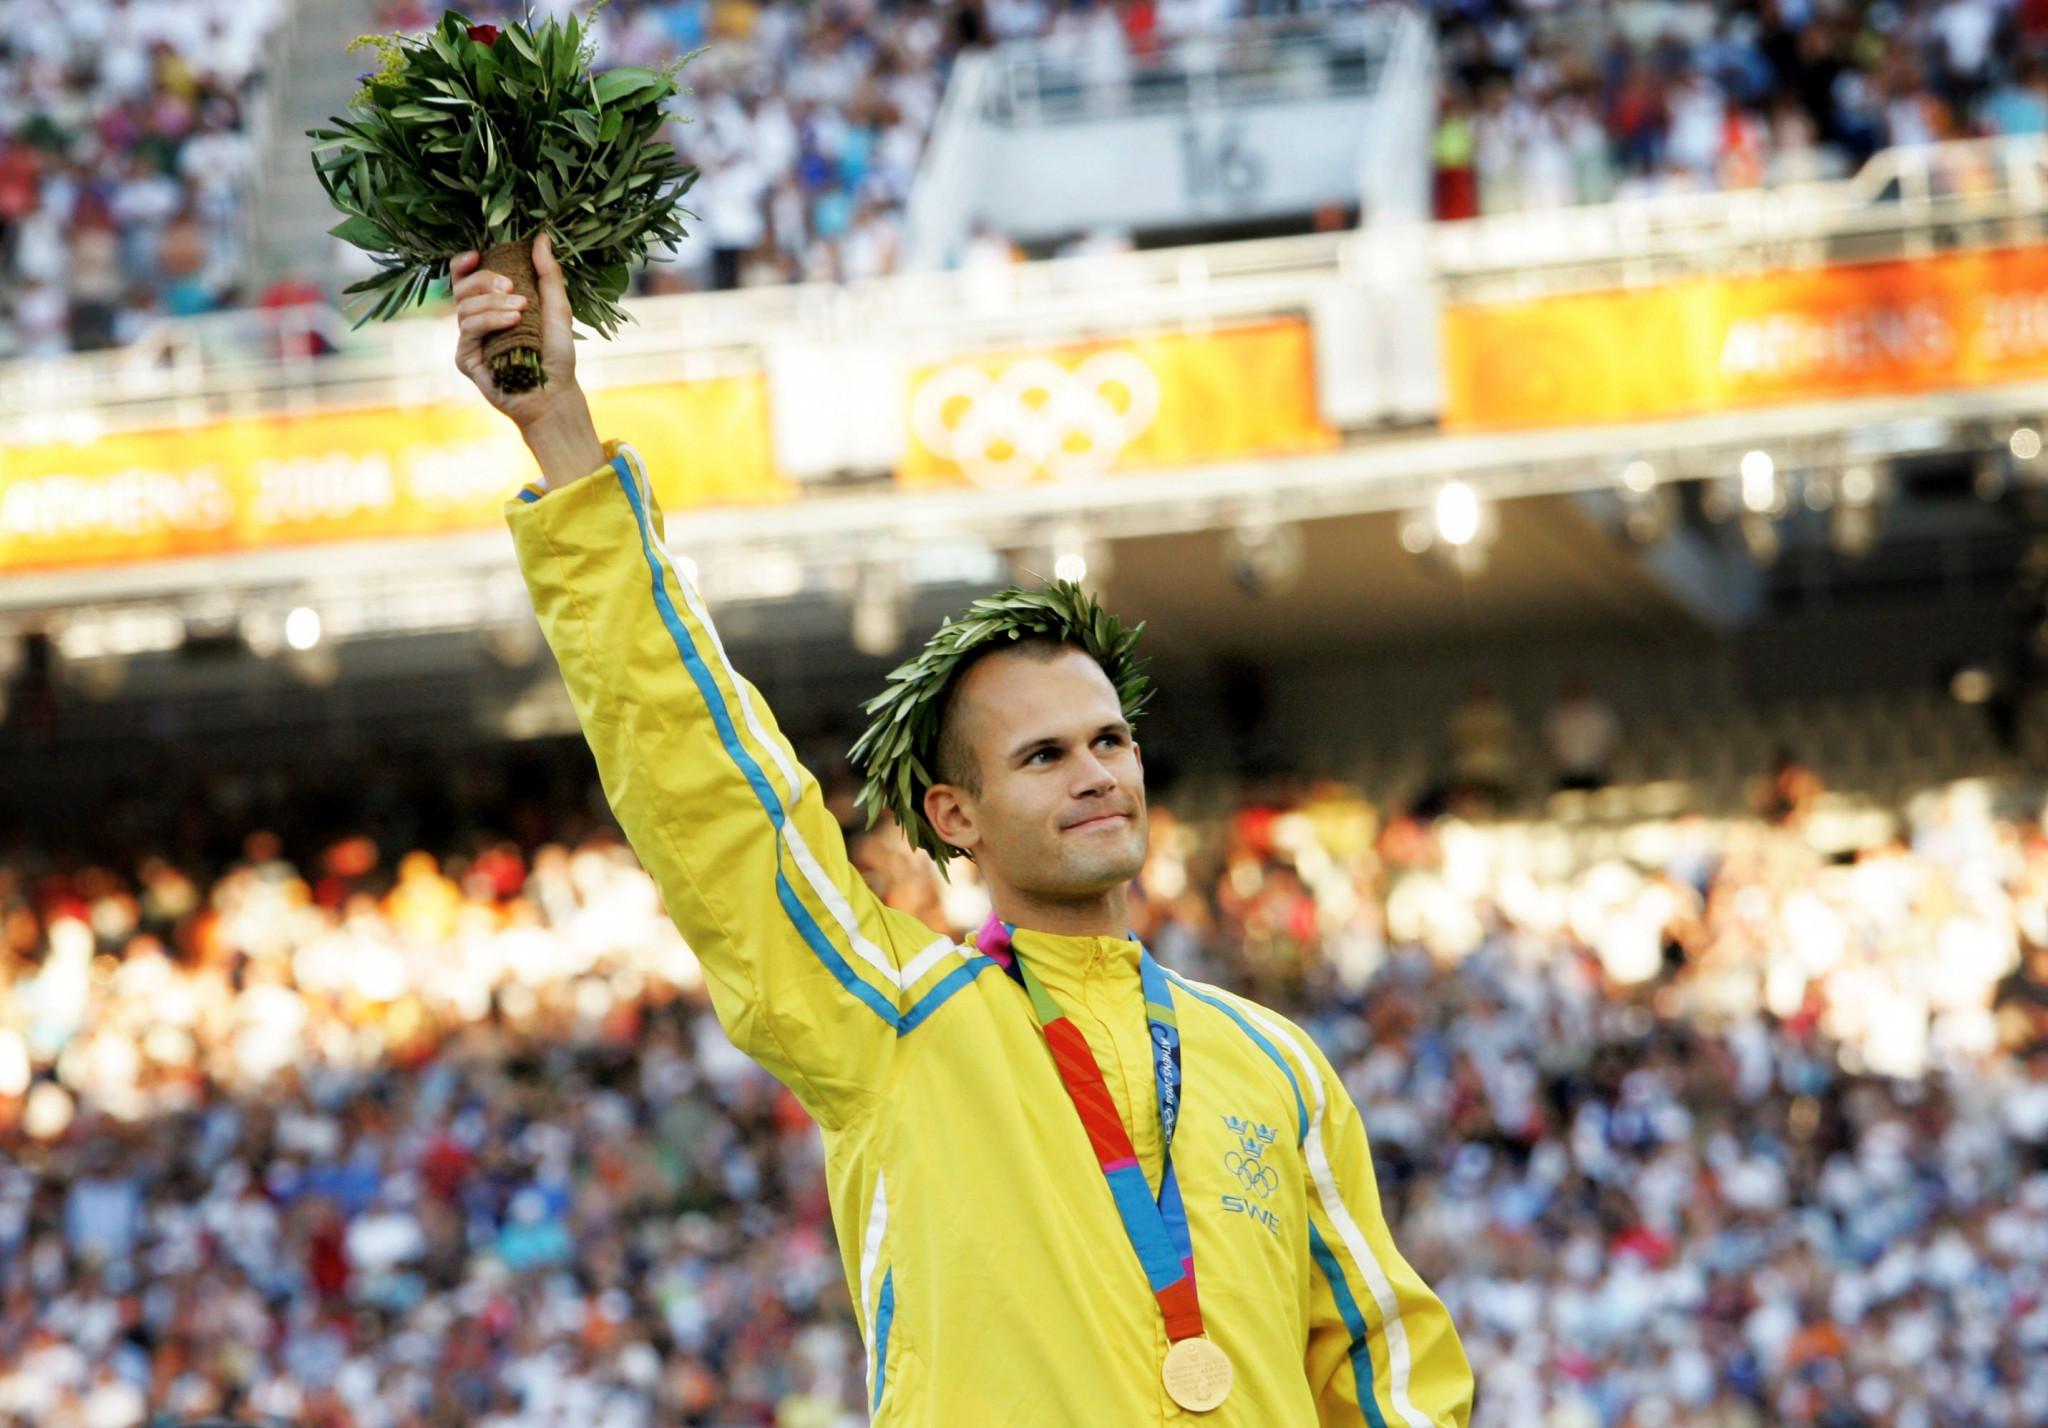 Swedish IOC member Holm presents case for Stockholm 2026 Winter Olympic bid